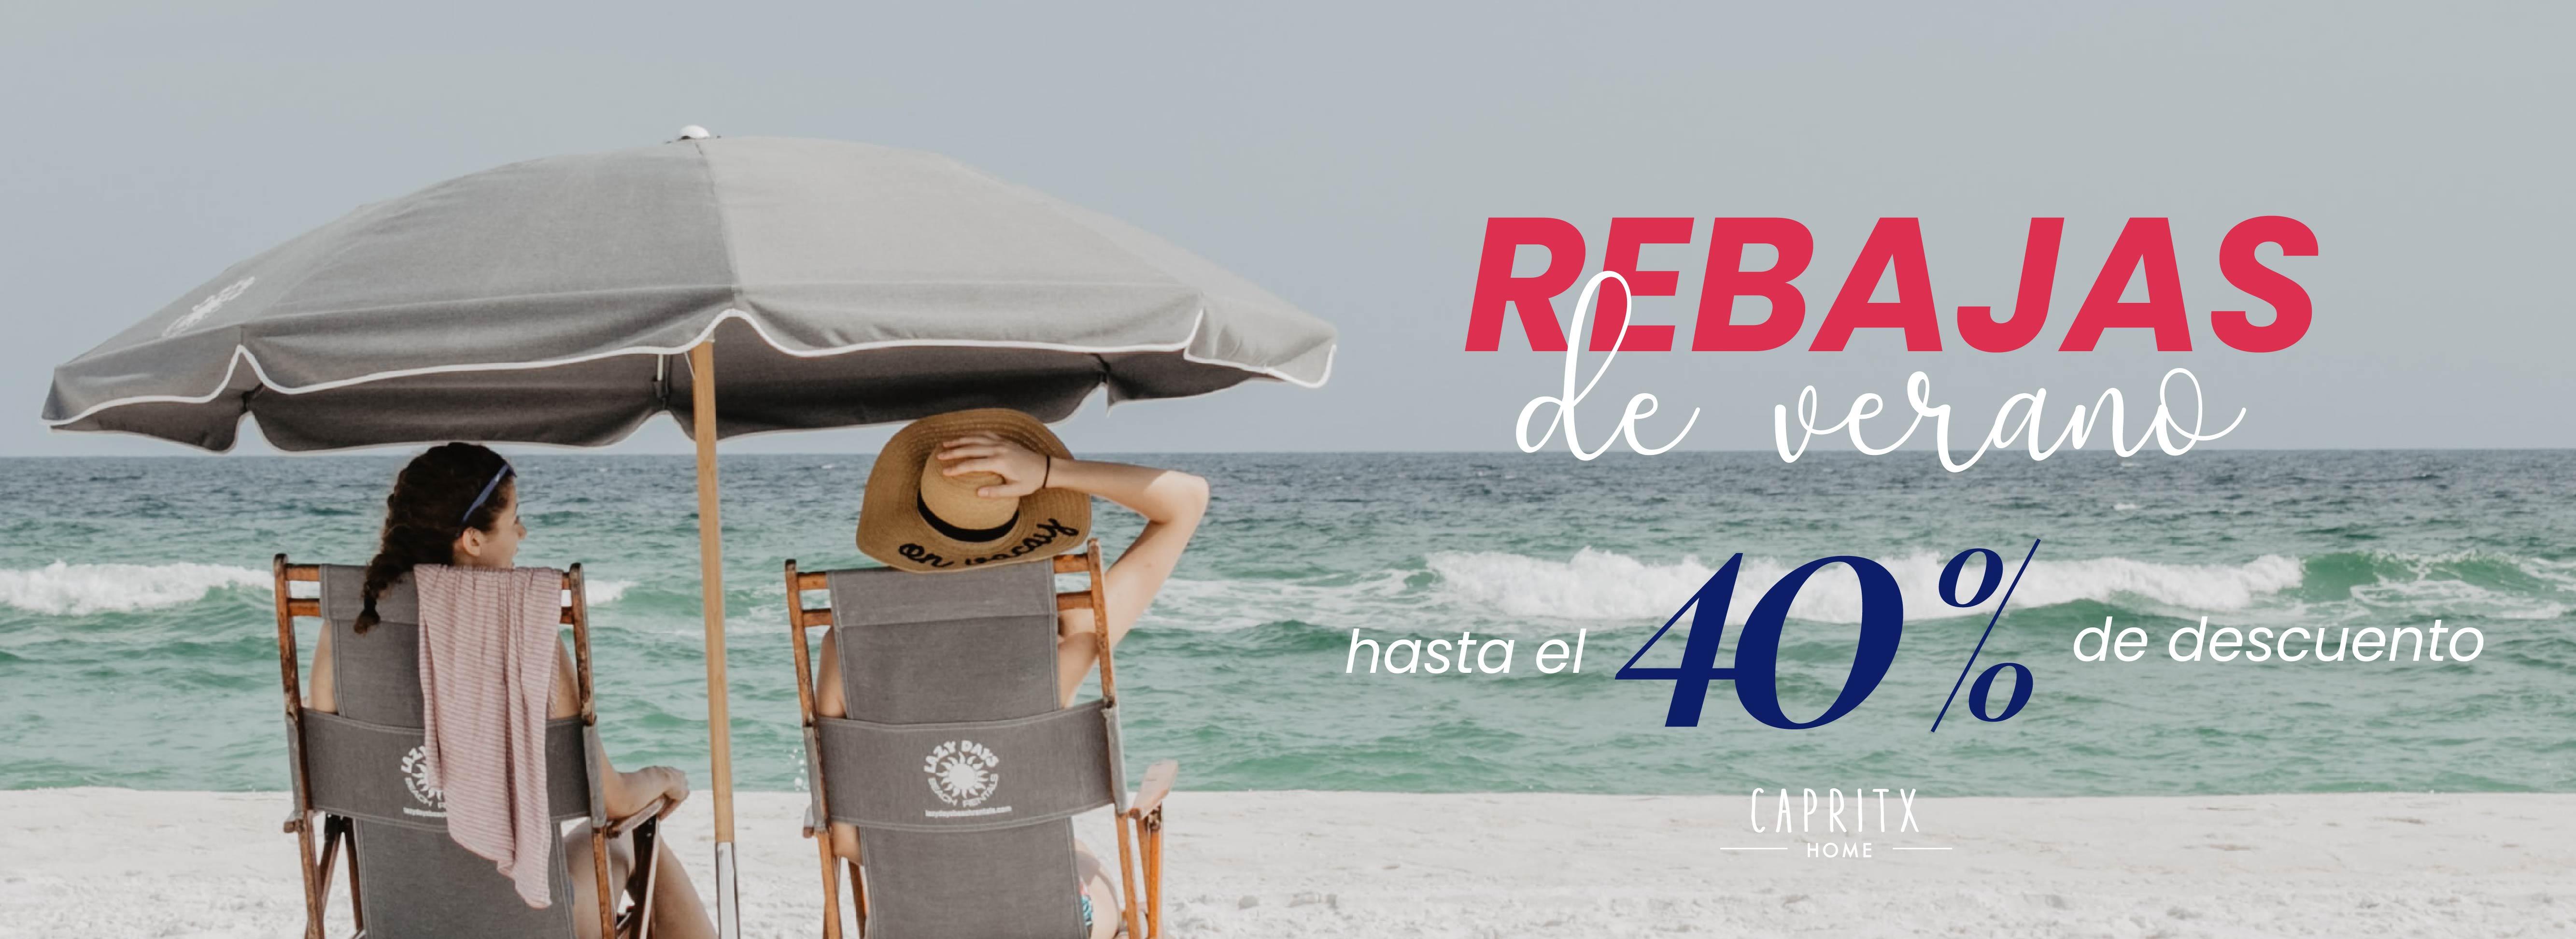 04_capritx_rebajas_verano_banner_web